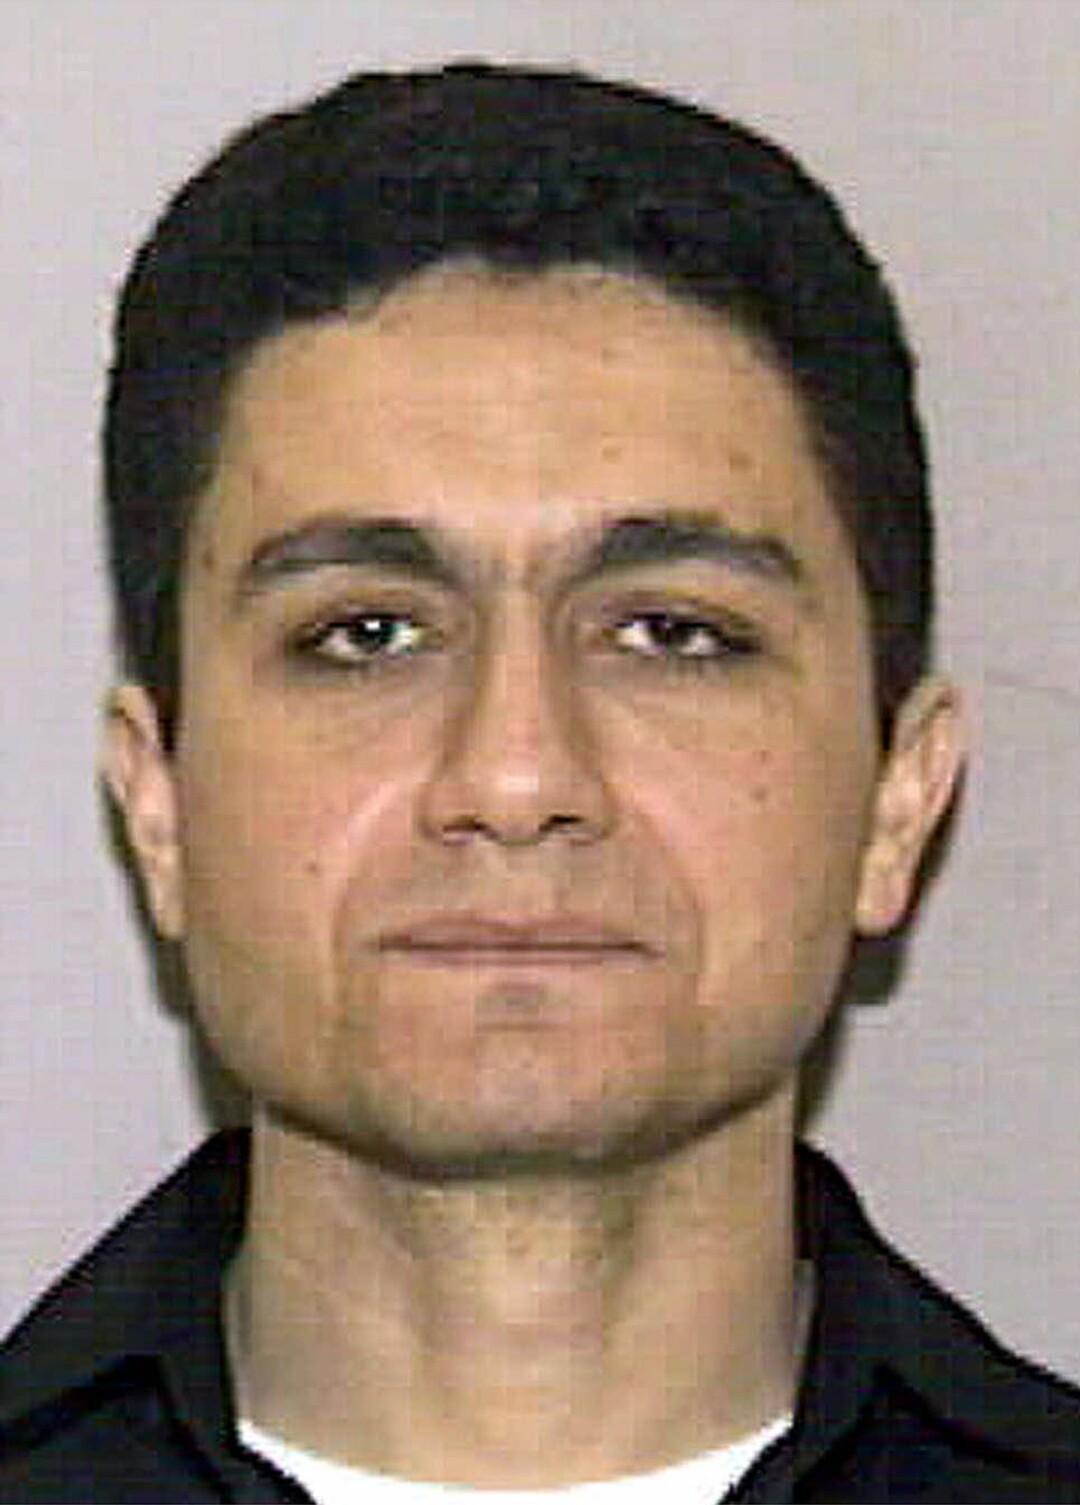 A man with dark hair and dark eyes in a black shirt